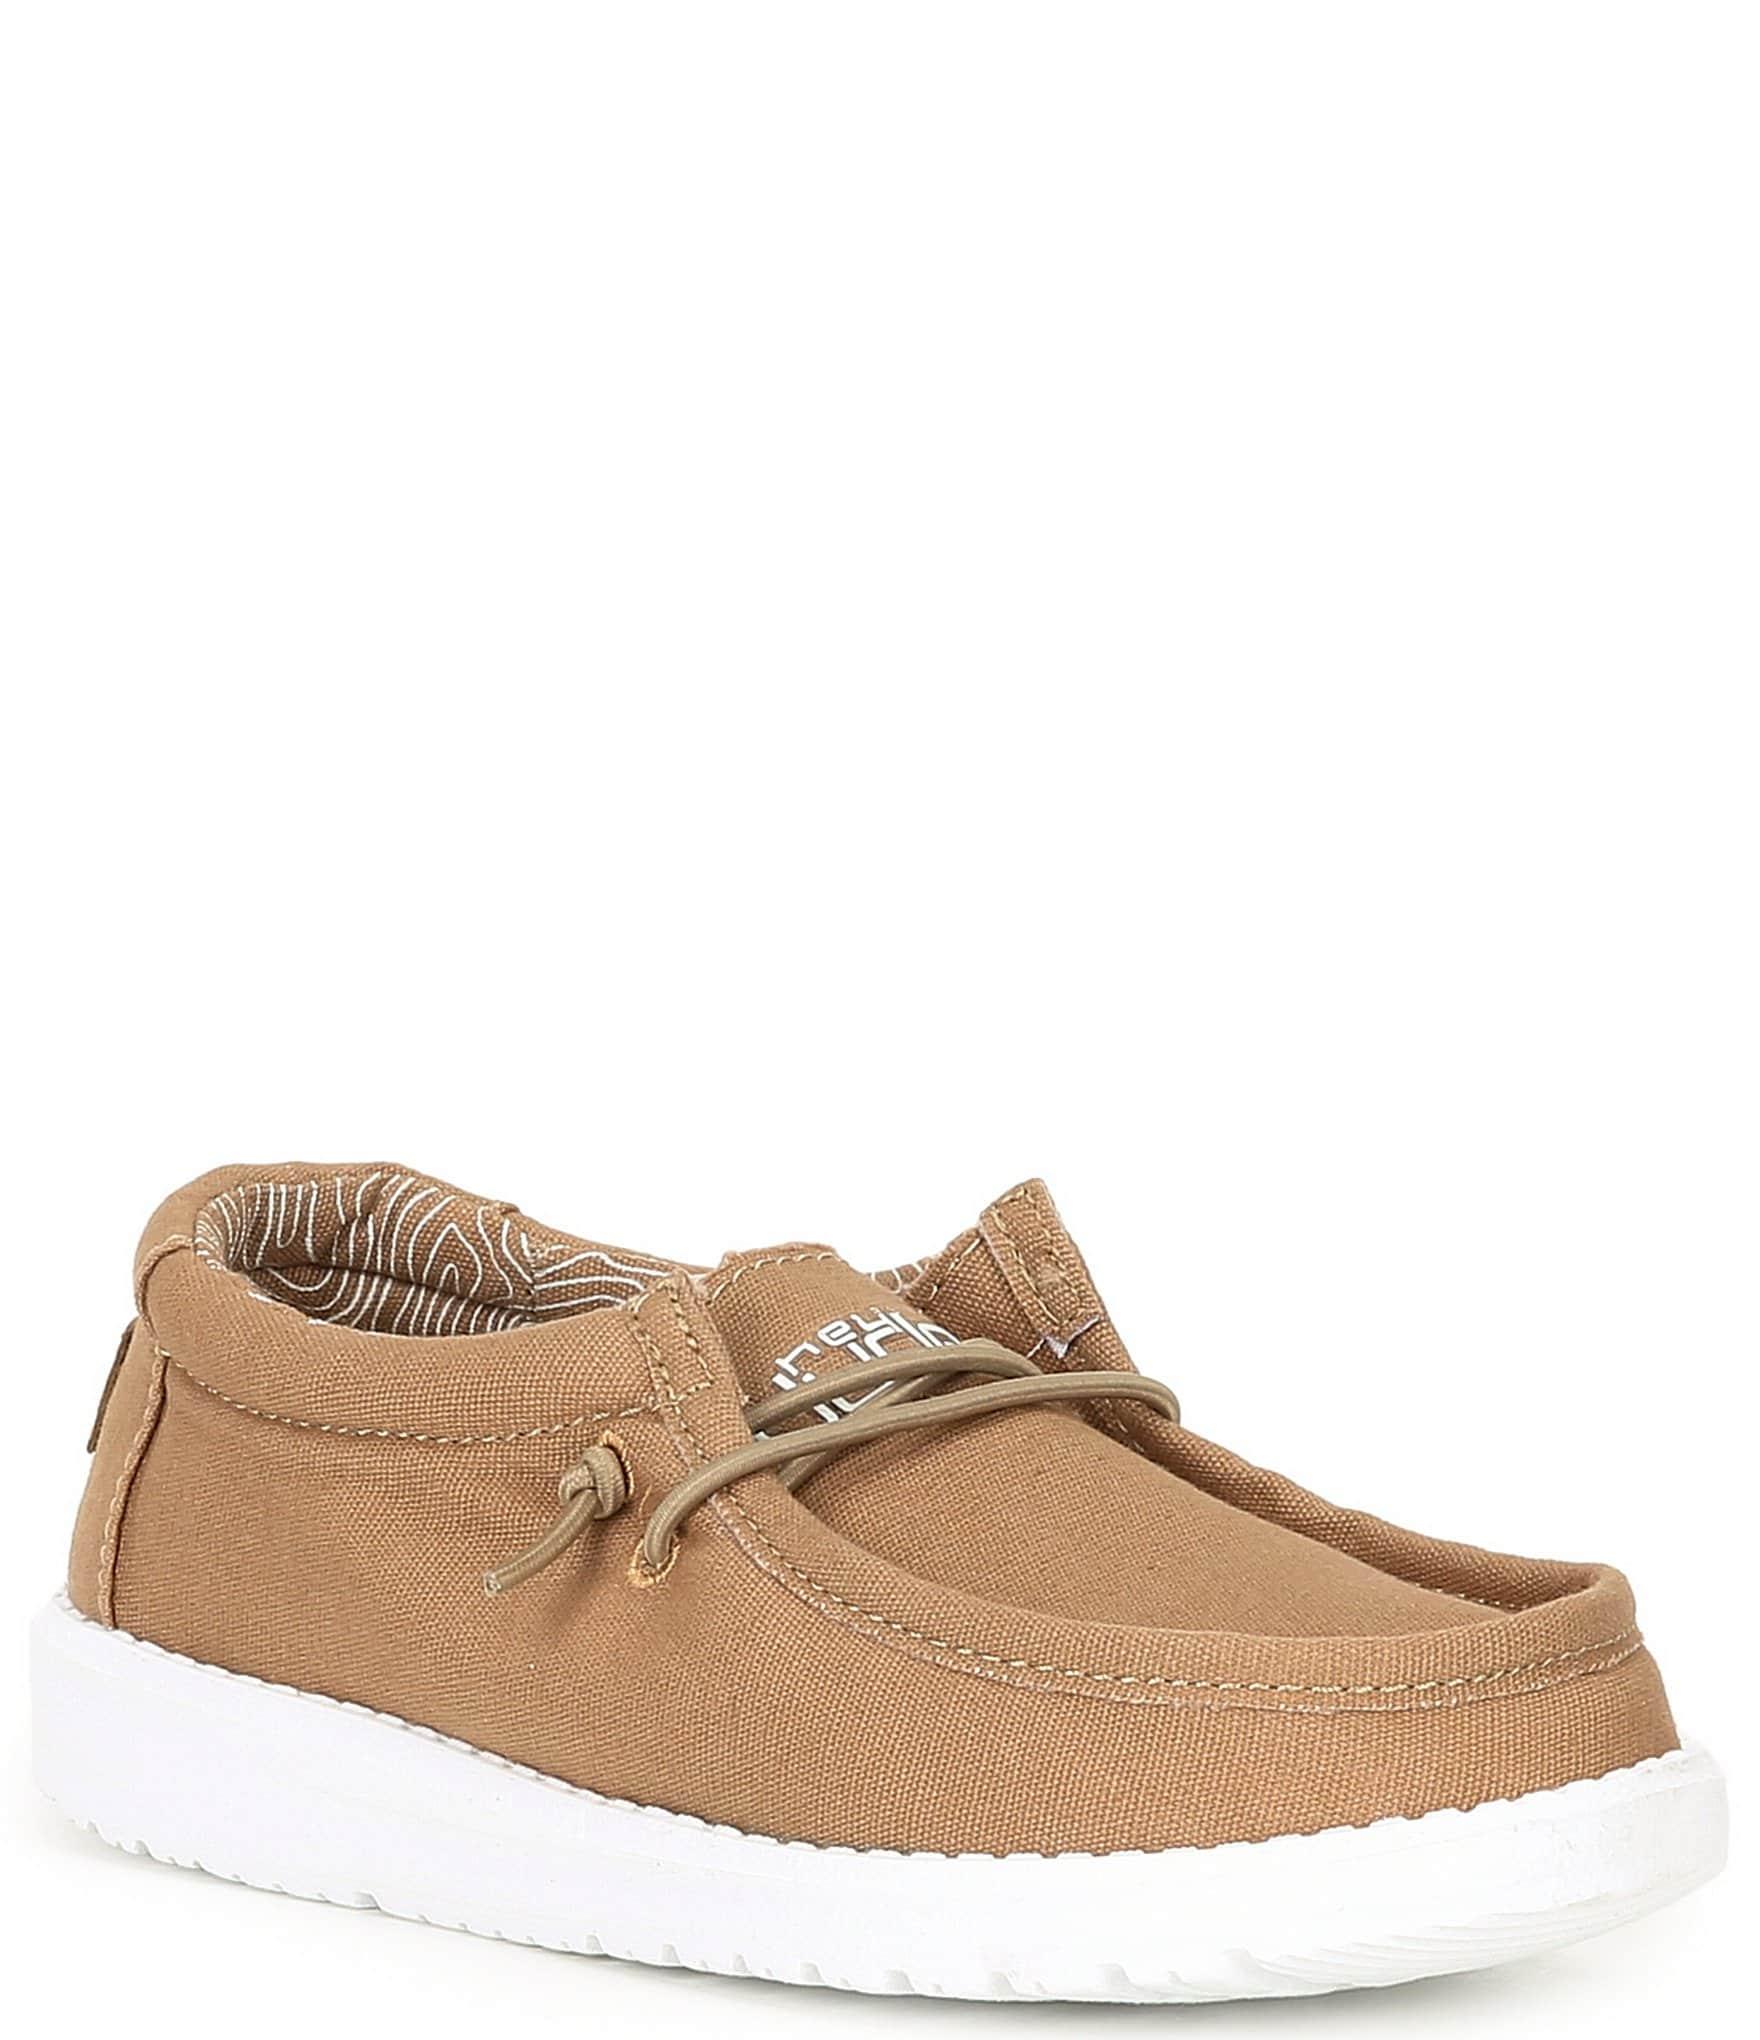 Tan Toddler Boys' Shoes | Dillard's